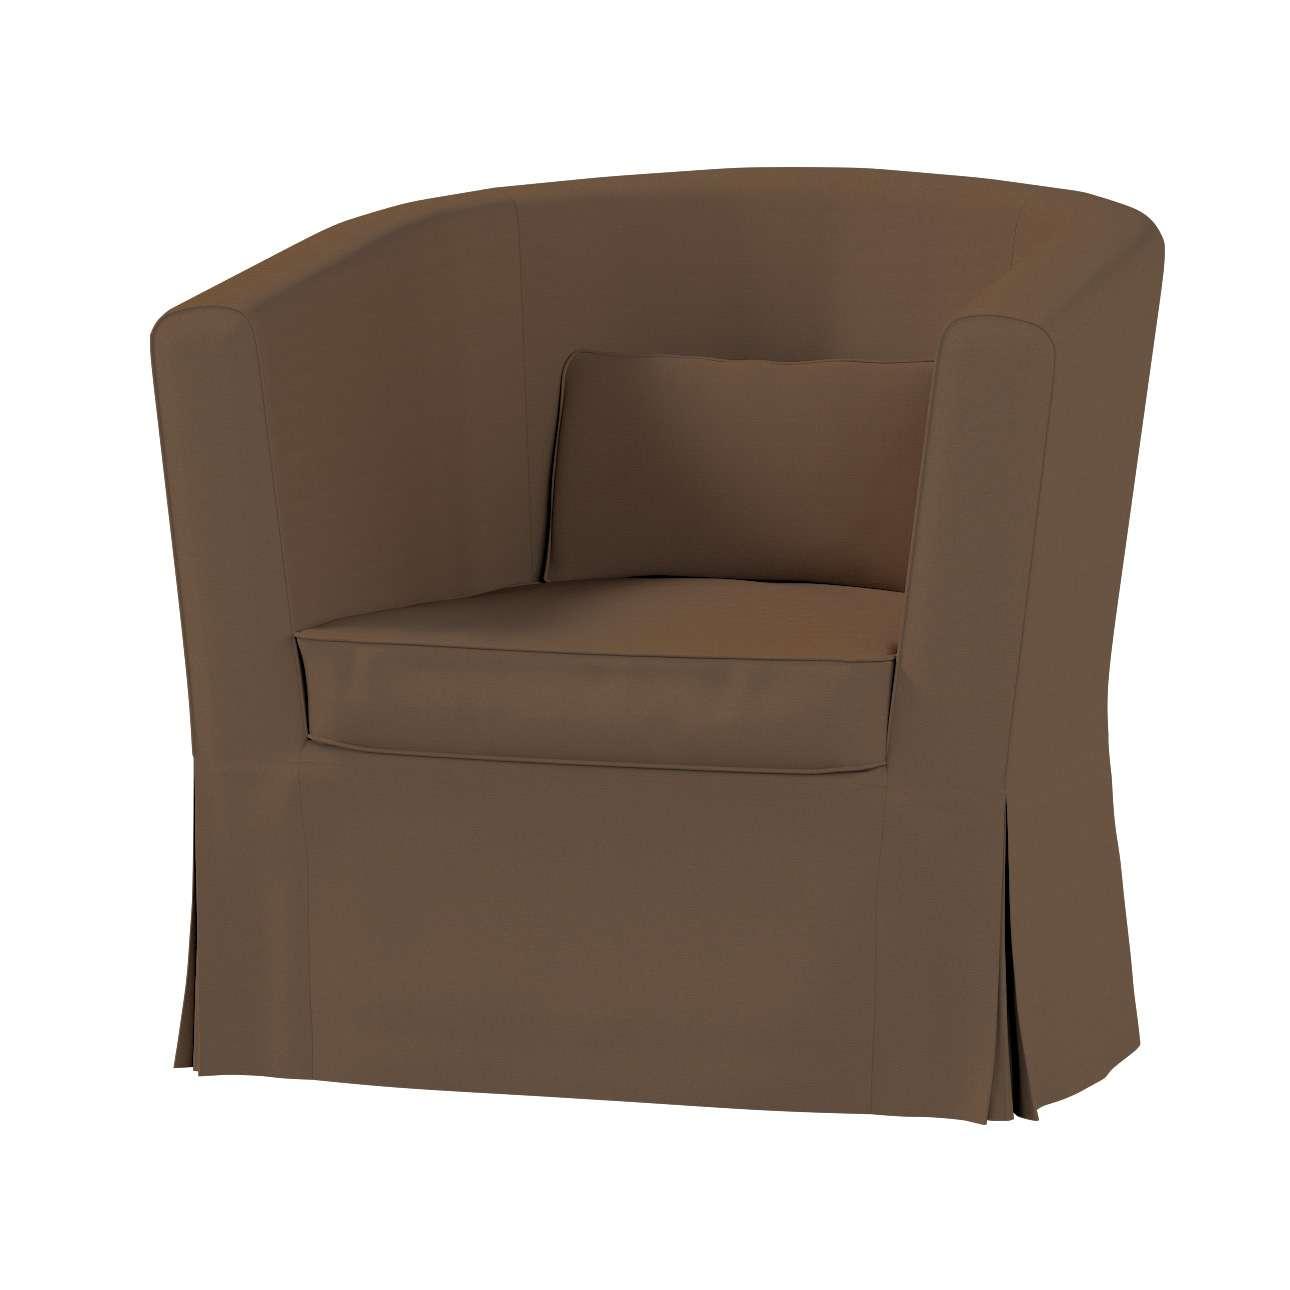 Ektorp Tullsta Sesselbezug Sesselhusse, Ektorp Tullsta von der Kollektion Cotton Panama, Stoff: 702-02